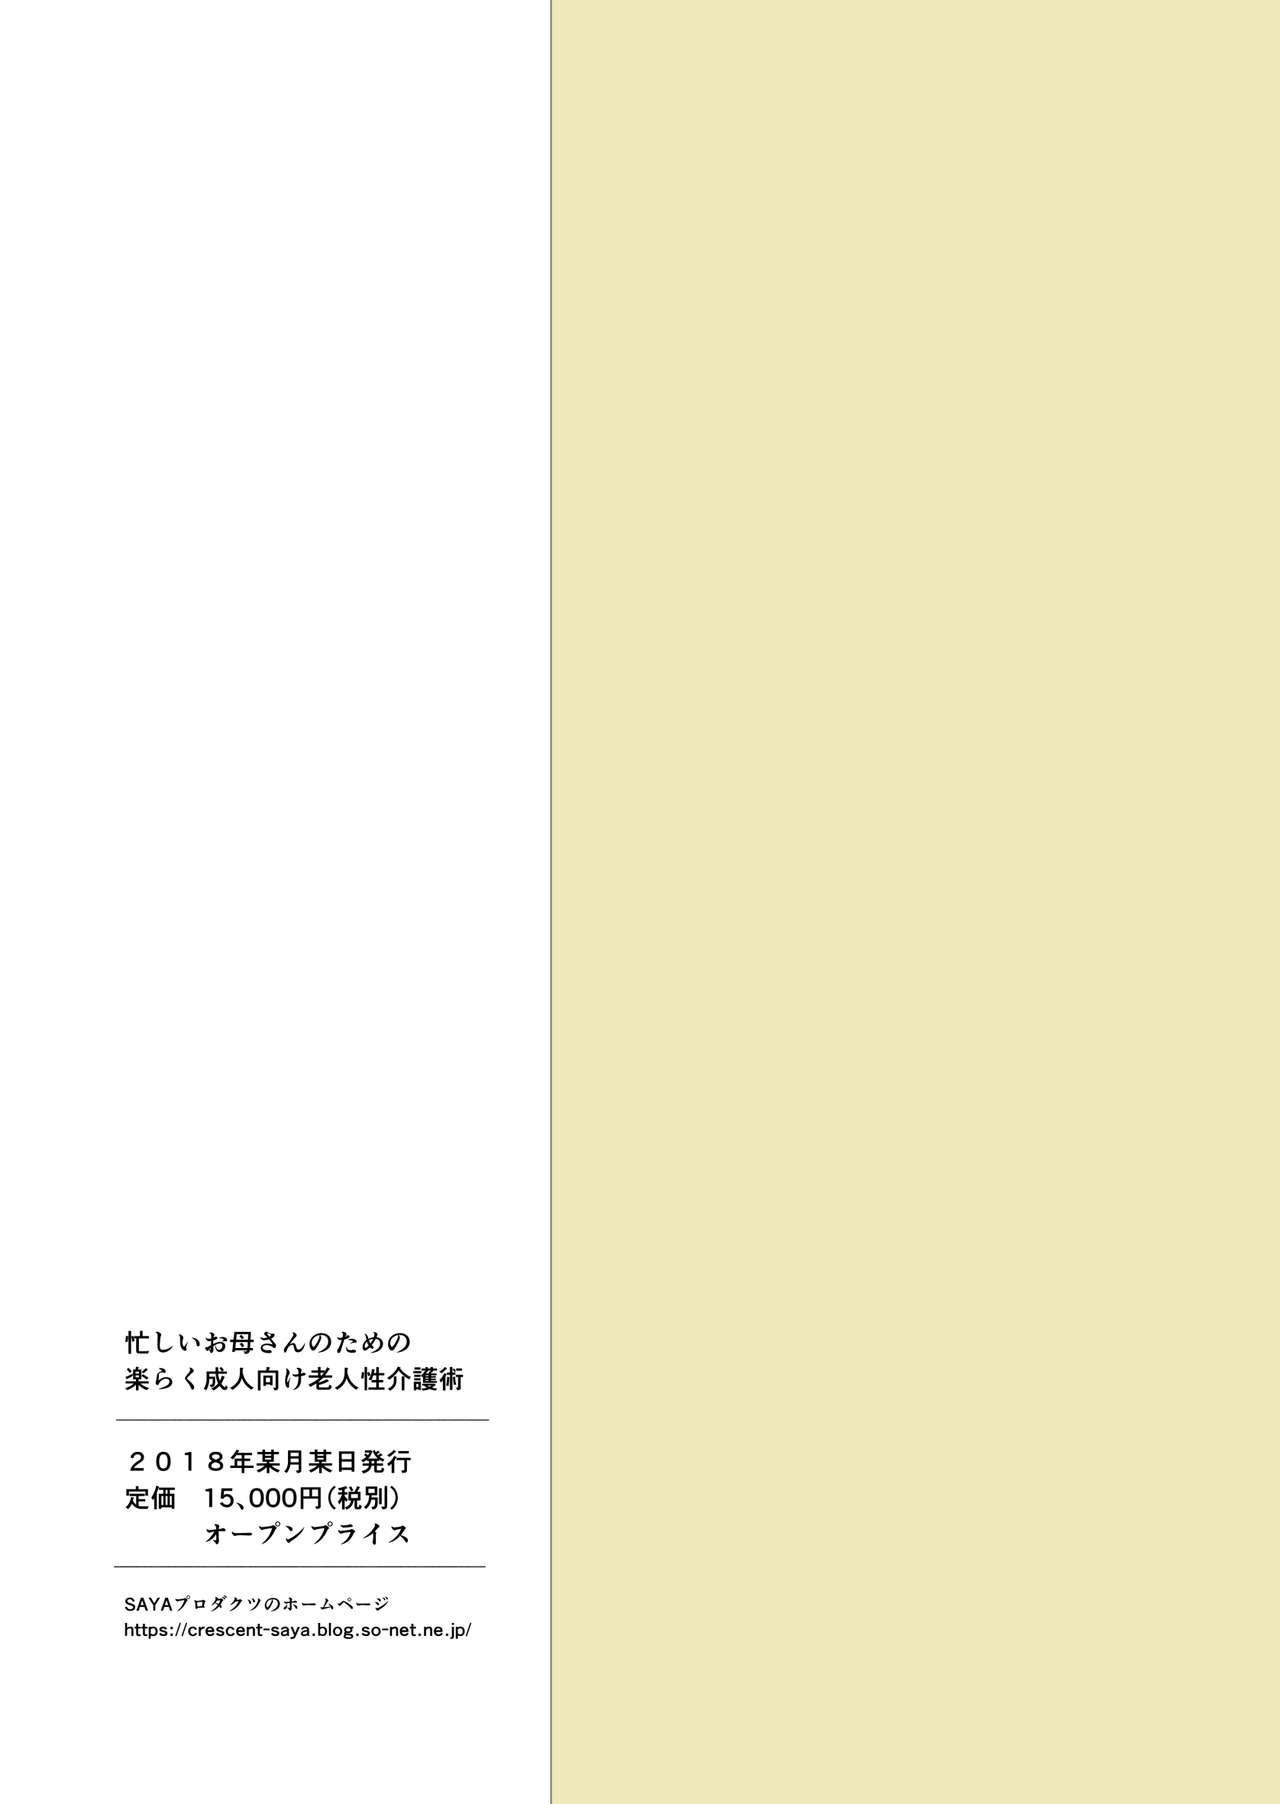 Isogasii Okaasan No Tamuno Sasa Rouzin Seikaigo | Guide for Elderly Sex Health Care to Busy Mom 71